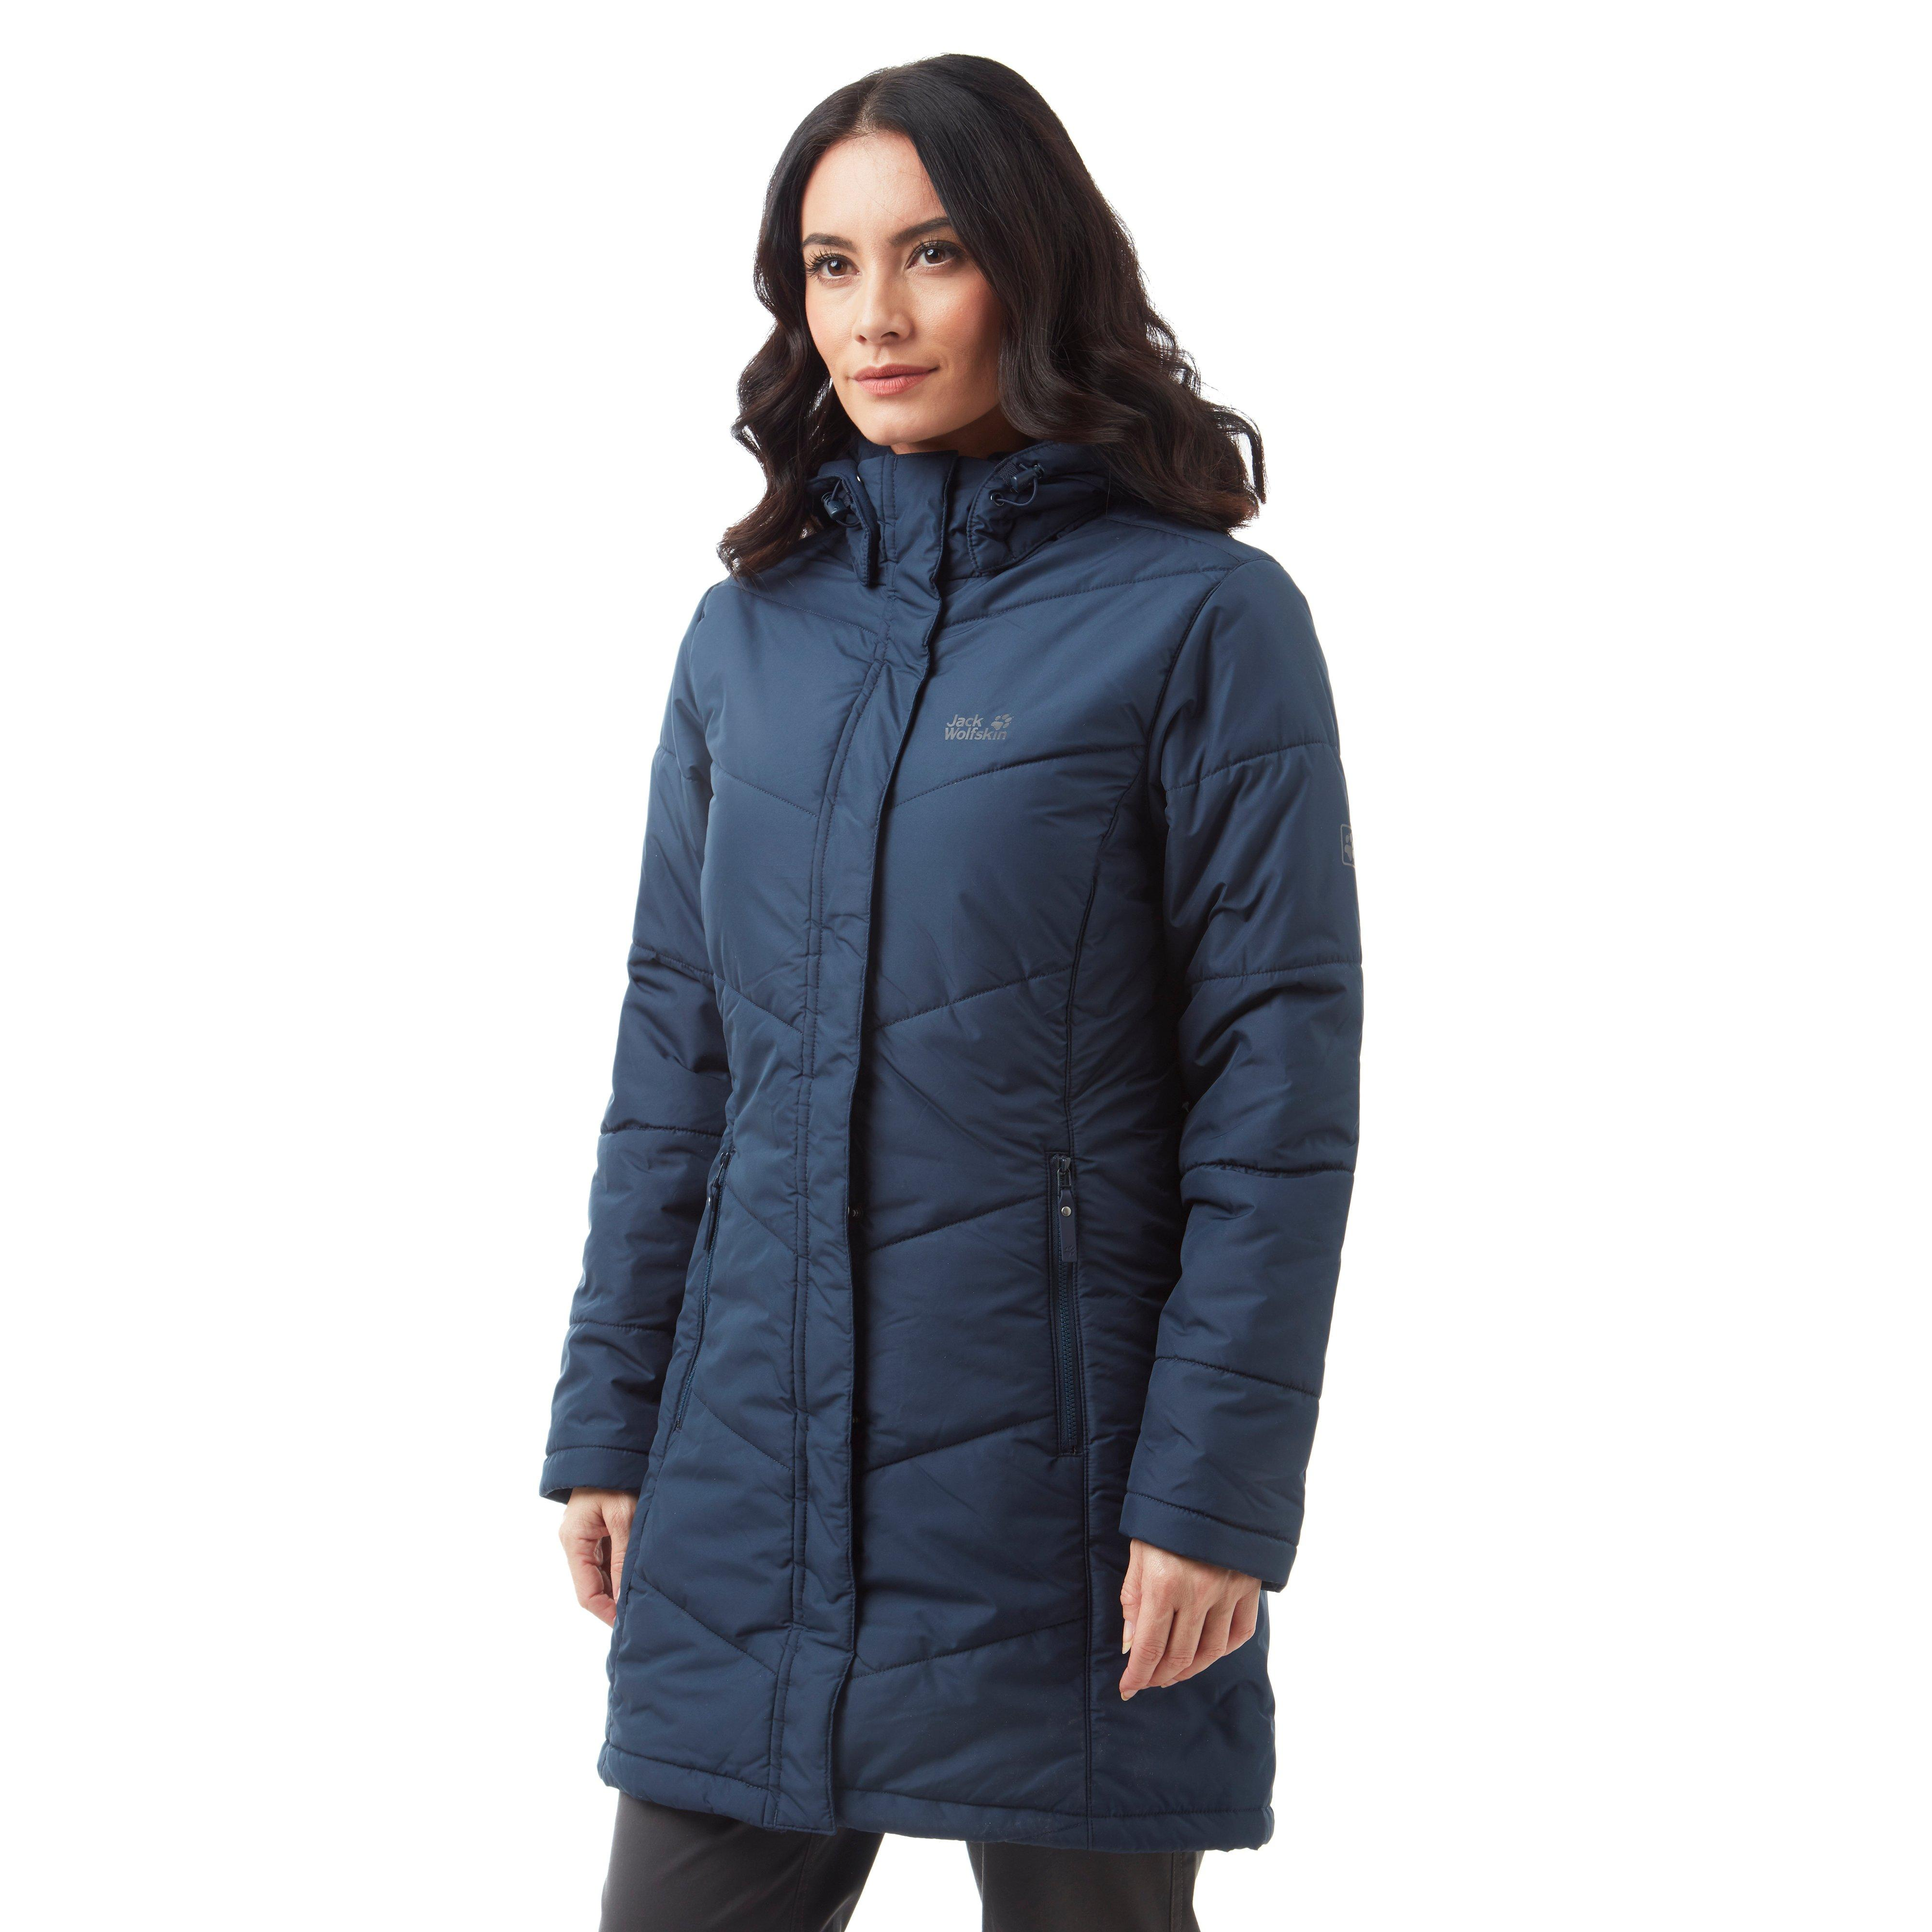 40b2e89ff3 Details about Jack Wolfskin Svalbard Windproof Women's Coat Navy